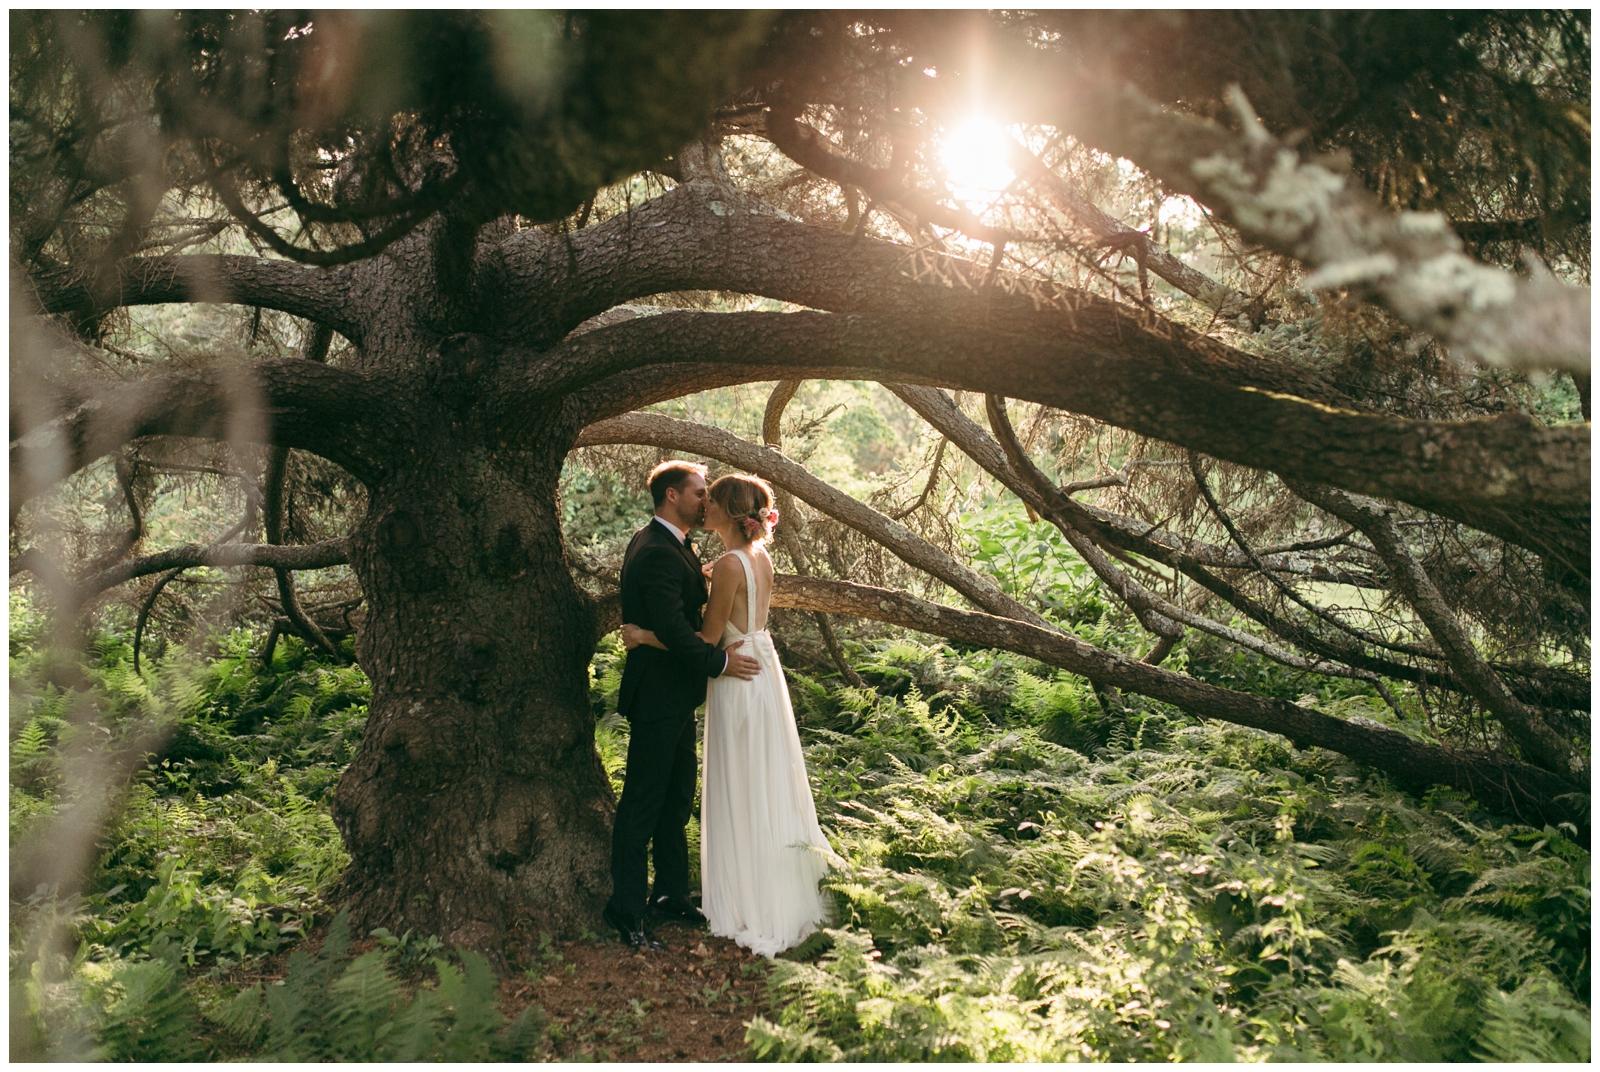 Moraine-Farm-wedding-Bailey-Q-Photo-Massachusetts-wedding-photpgrapher-001.jpg